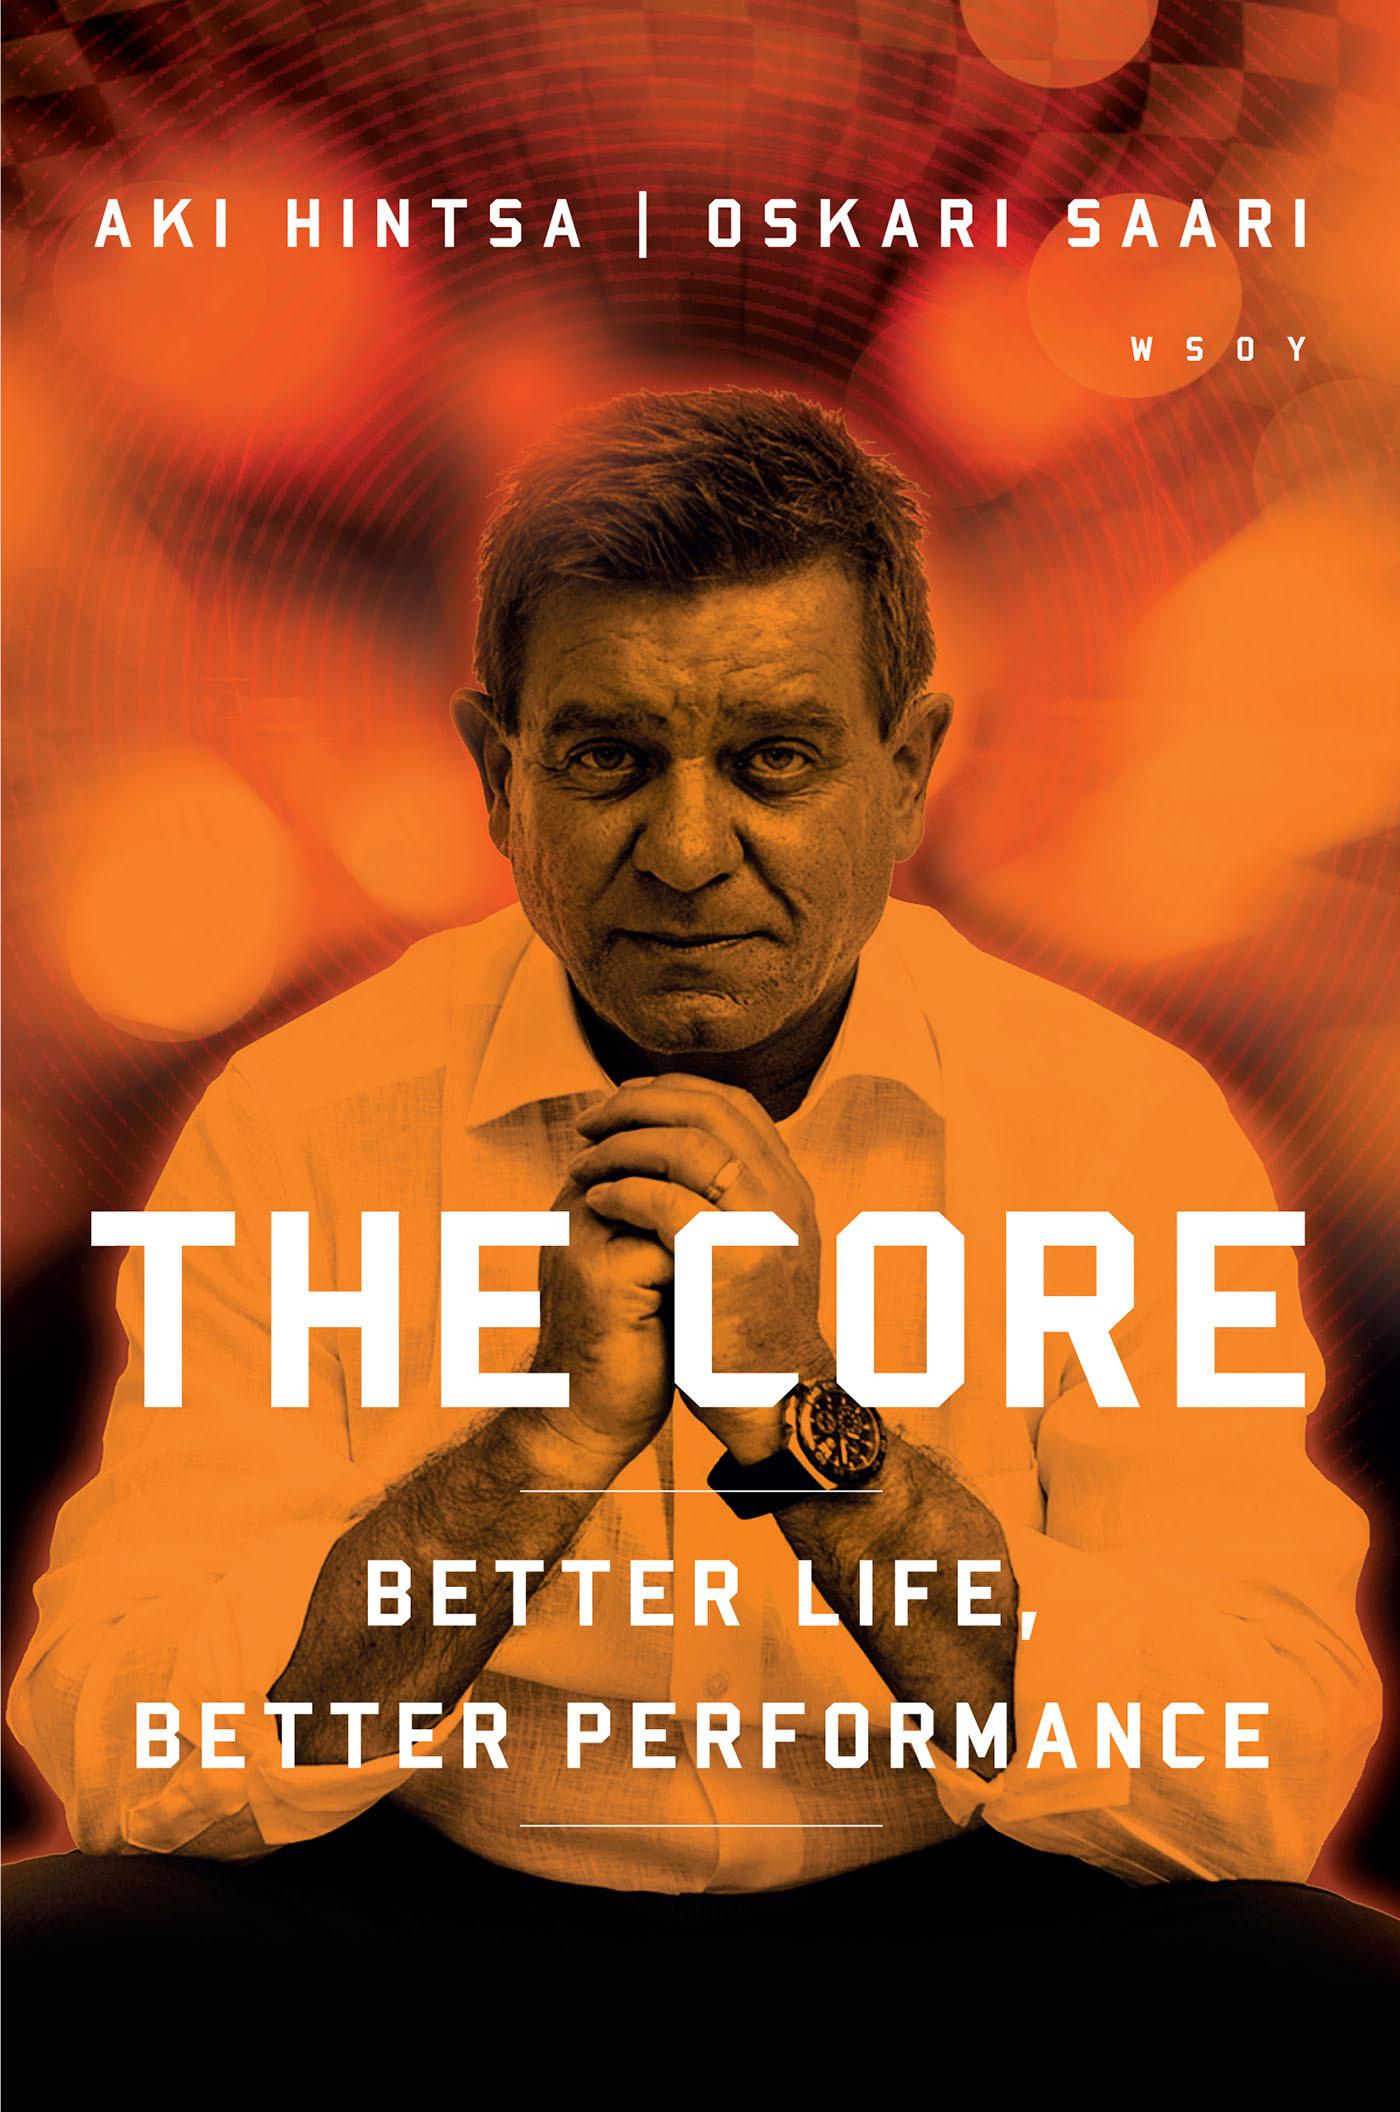 Saari, Oskari - The Core: Better Life, Better Performance, ebook